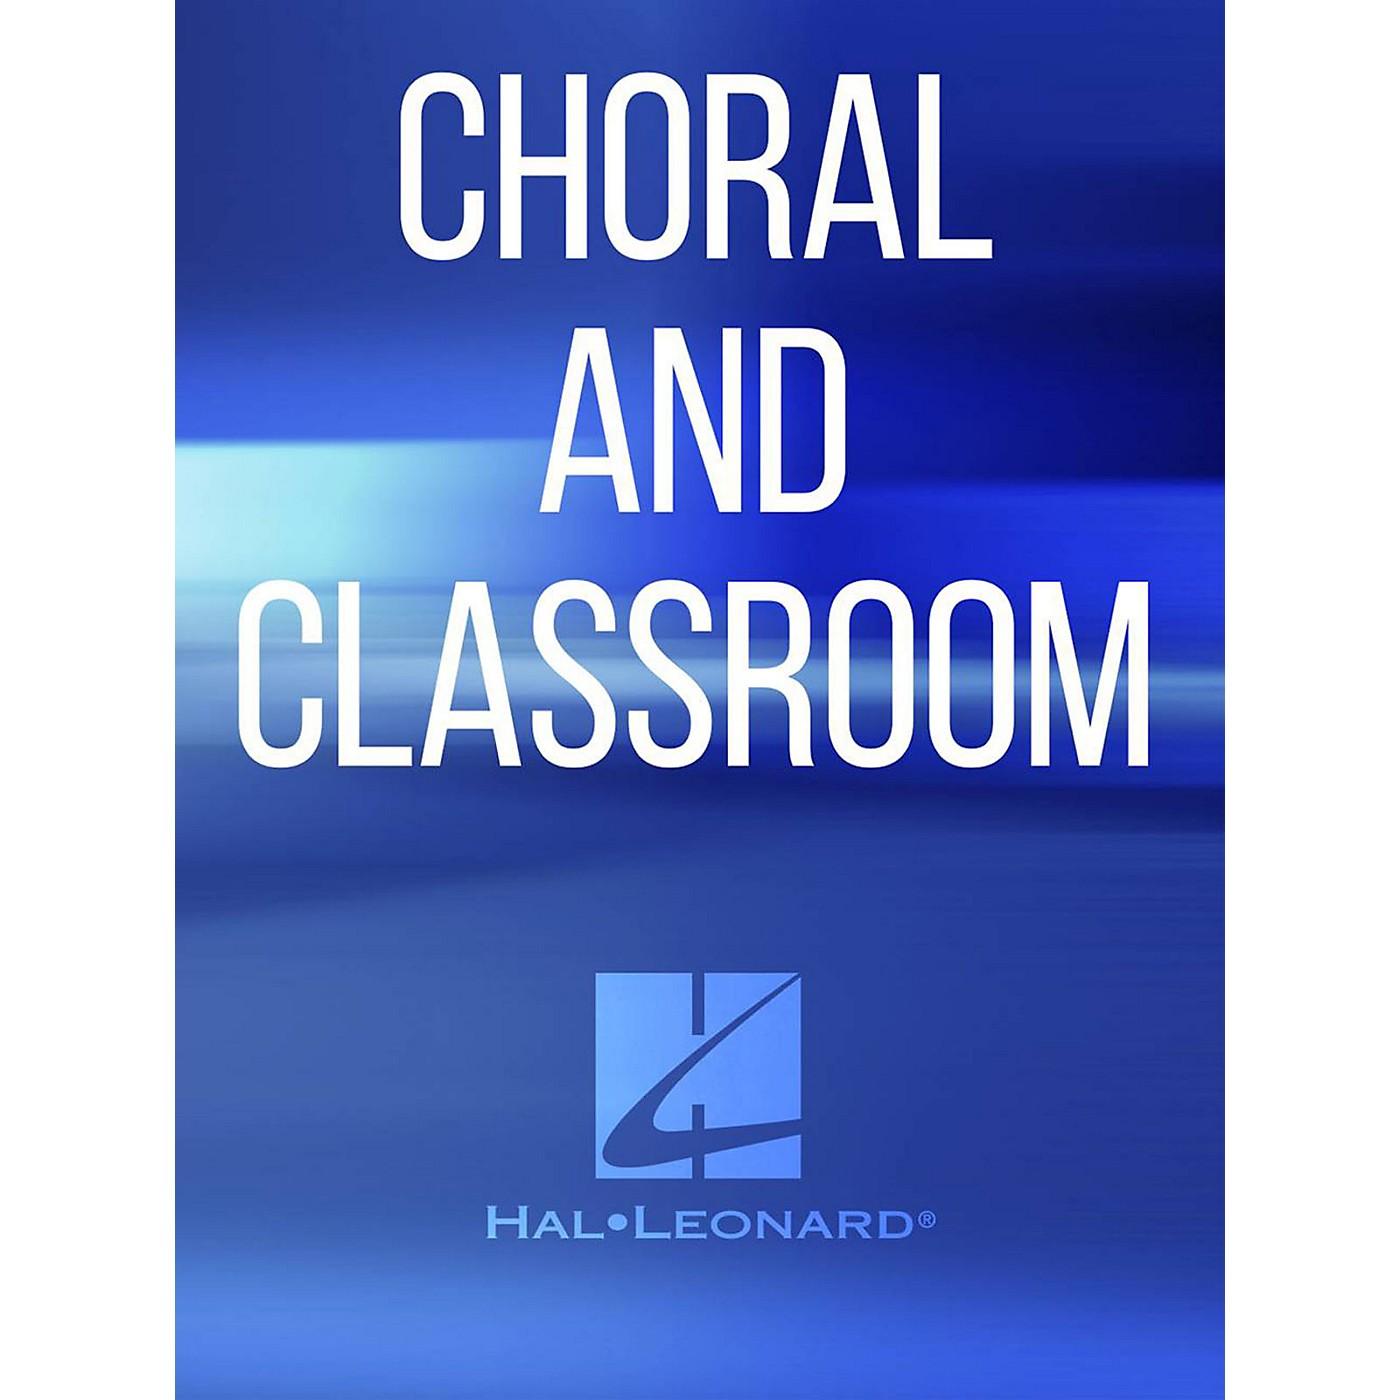 Hal Leonard Circle of Life IPAKR by Elton John Arranged by Keith Christopher thumbnail